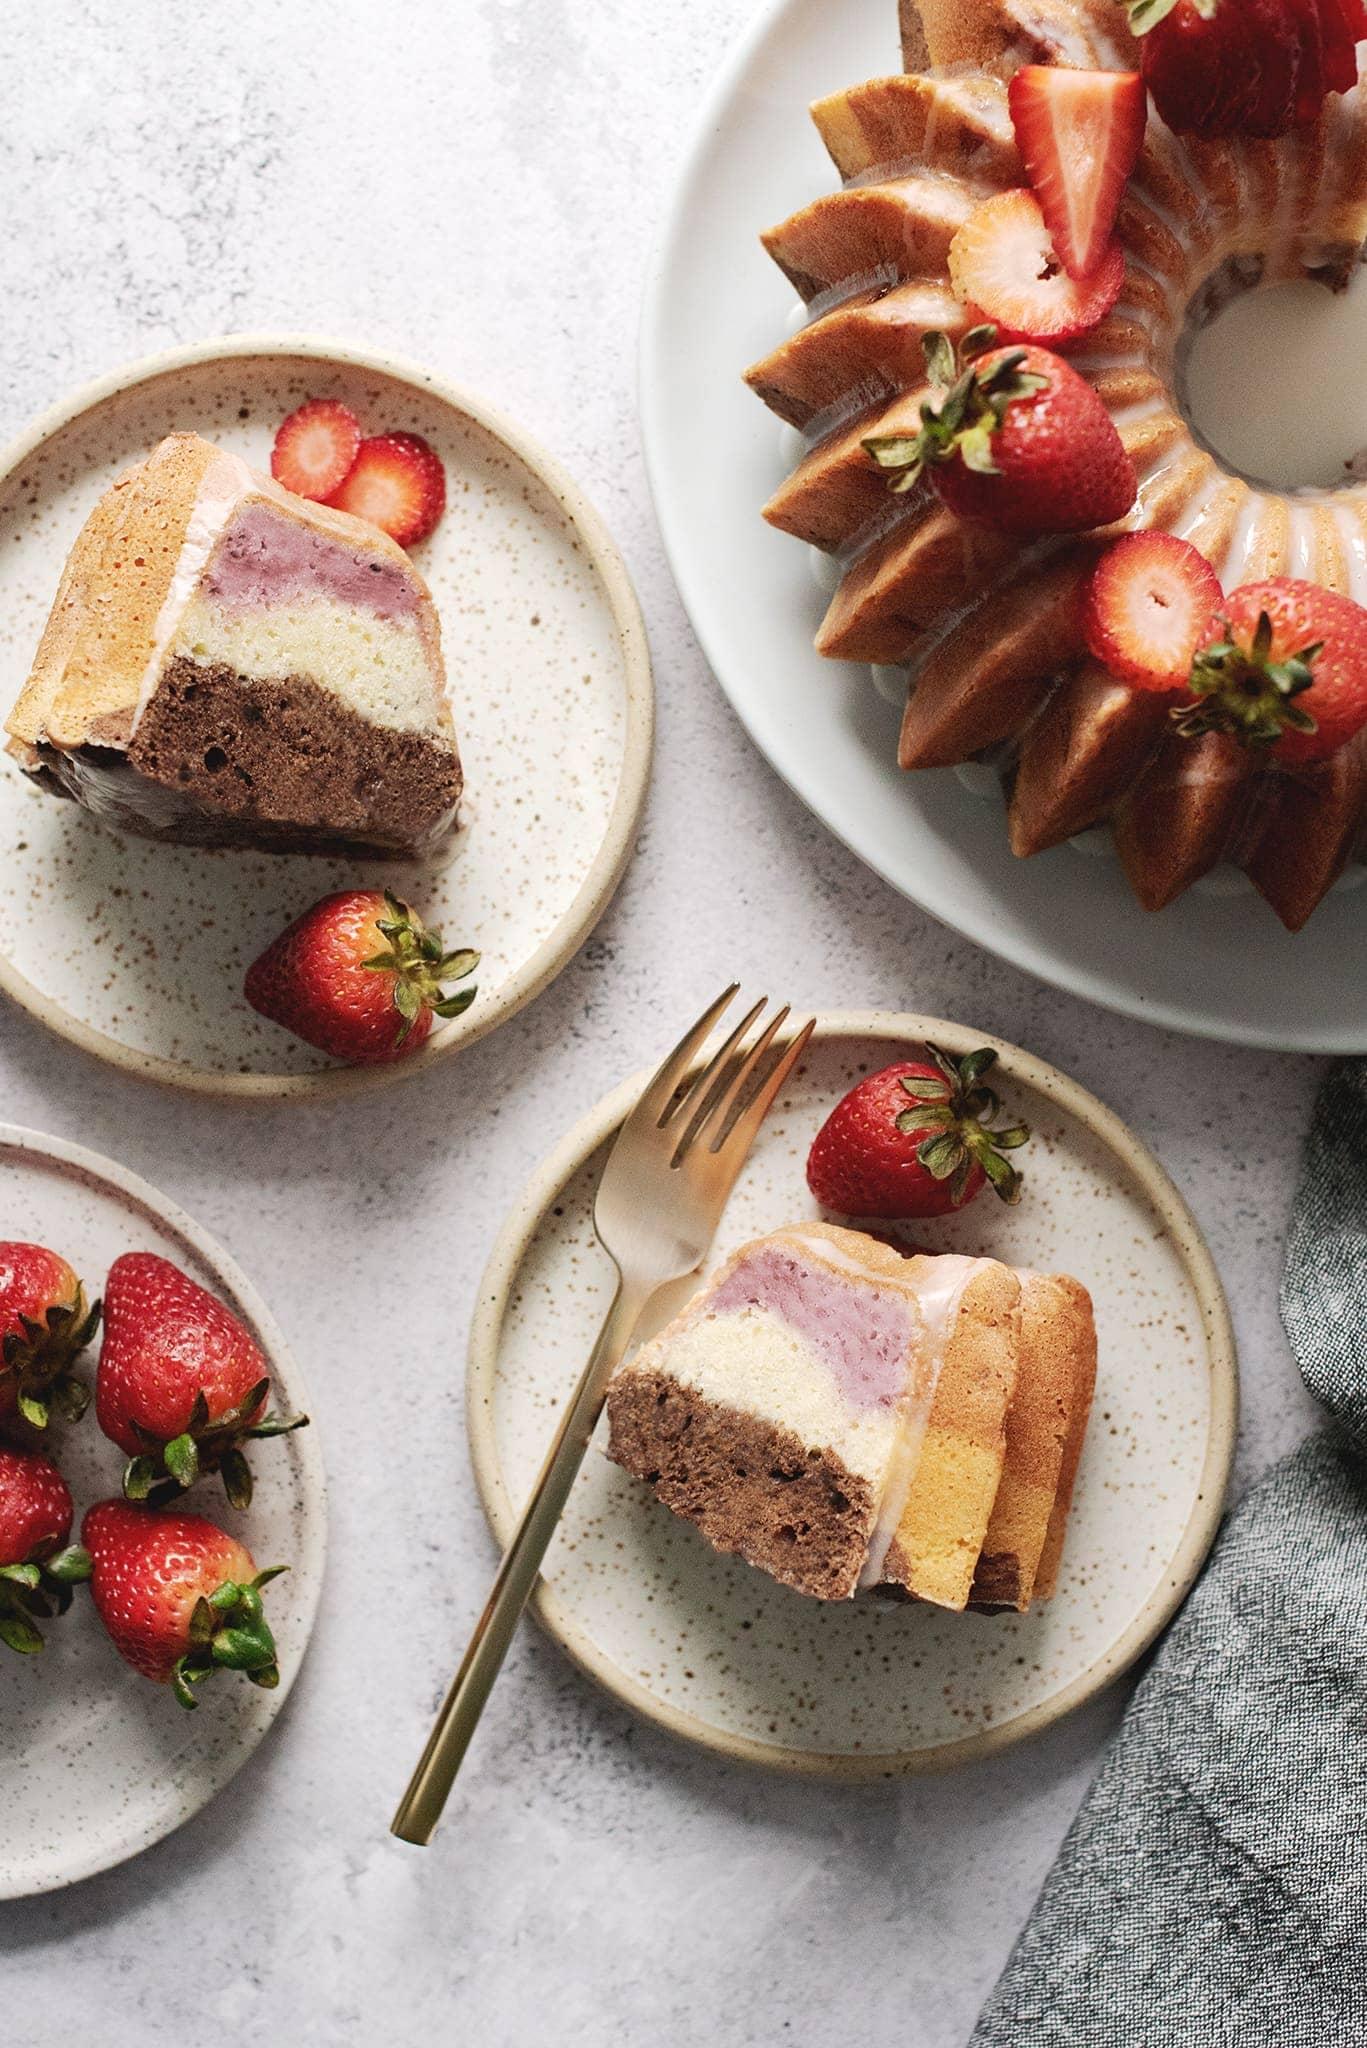 Slices of neapolitan bundt cake on plates